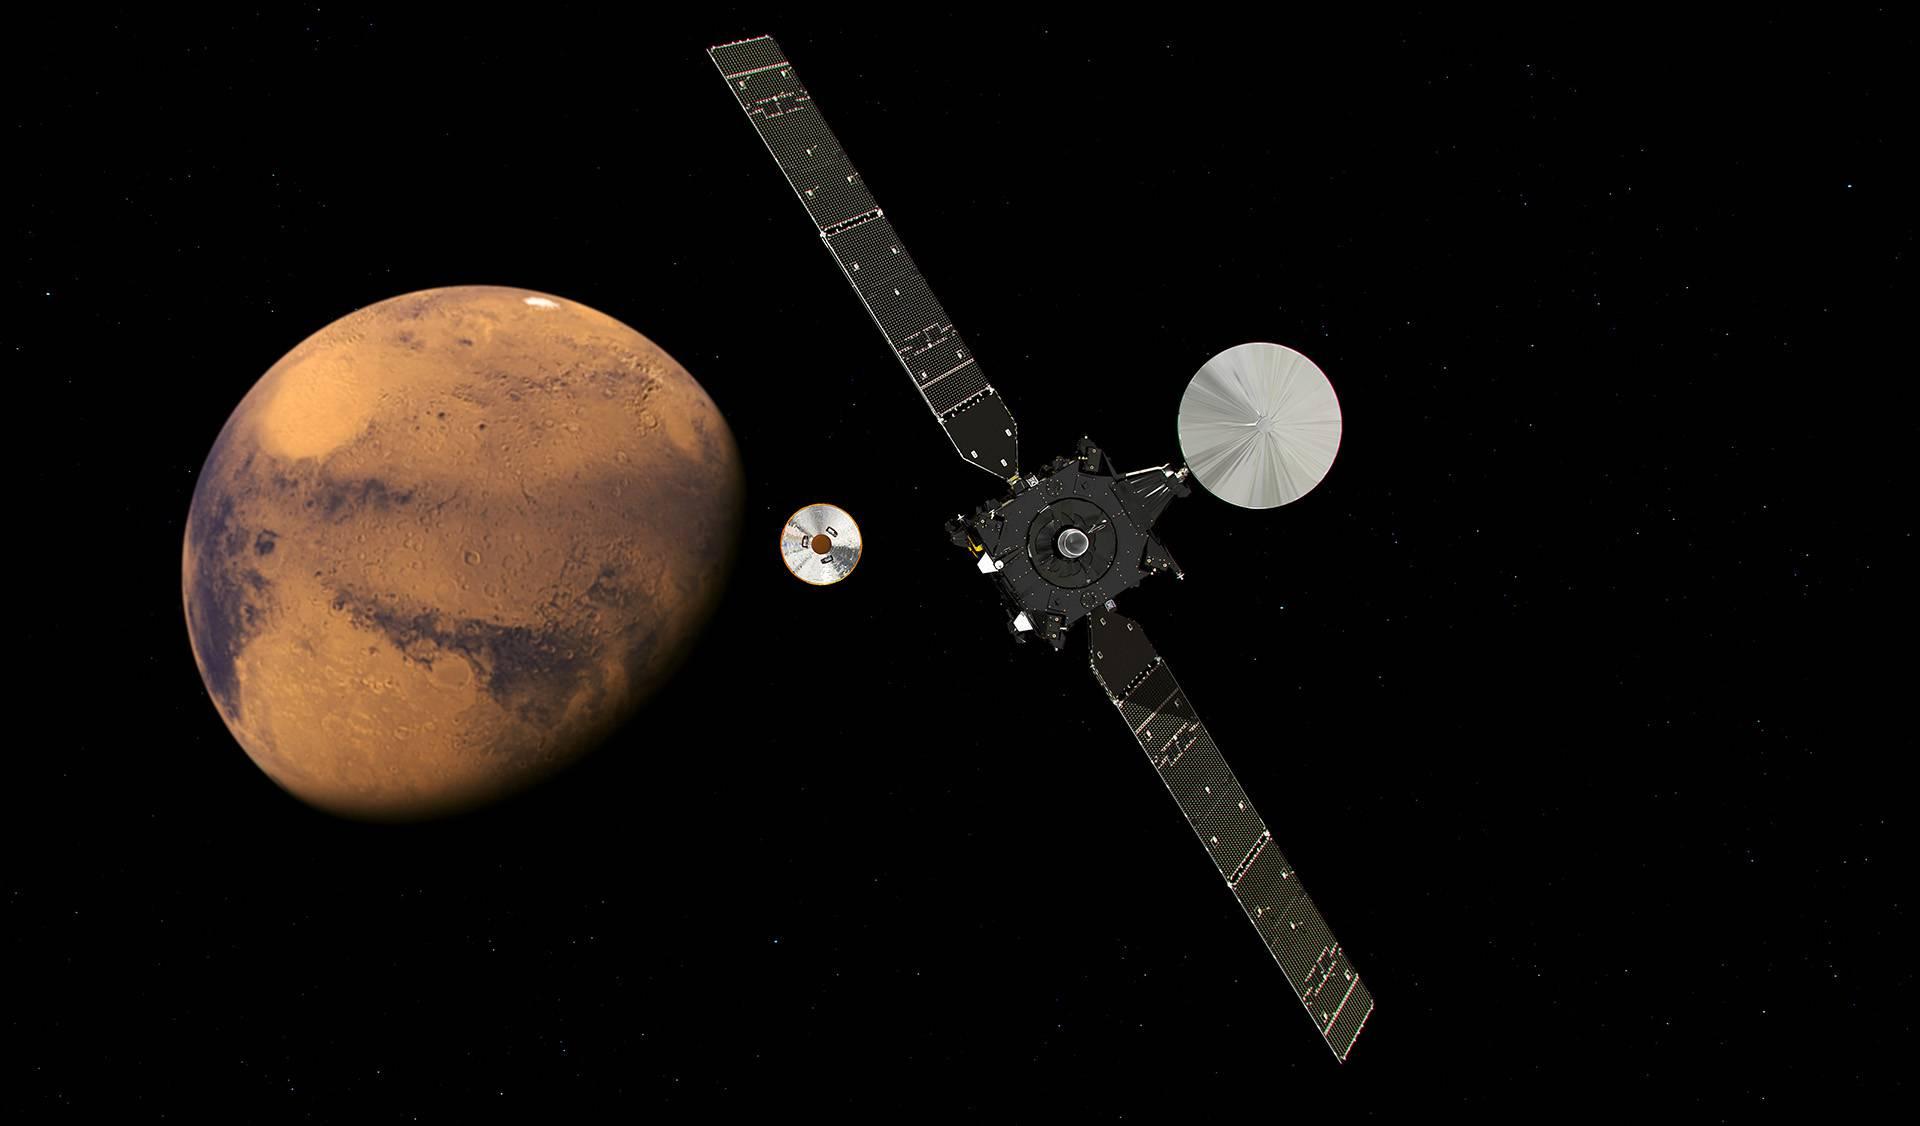 Kinezi osvajaju svemir: Poslat će letjelice na Mars i Jupiter